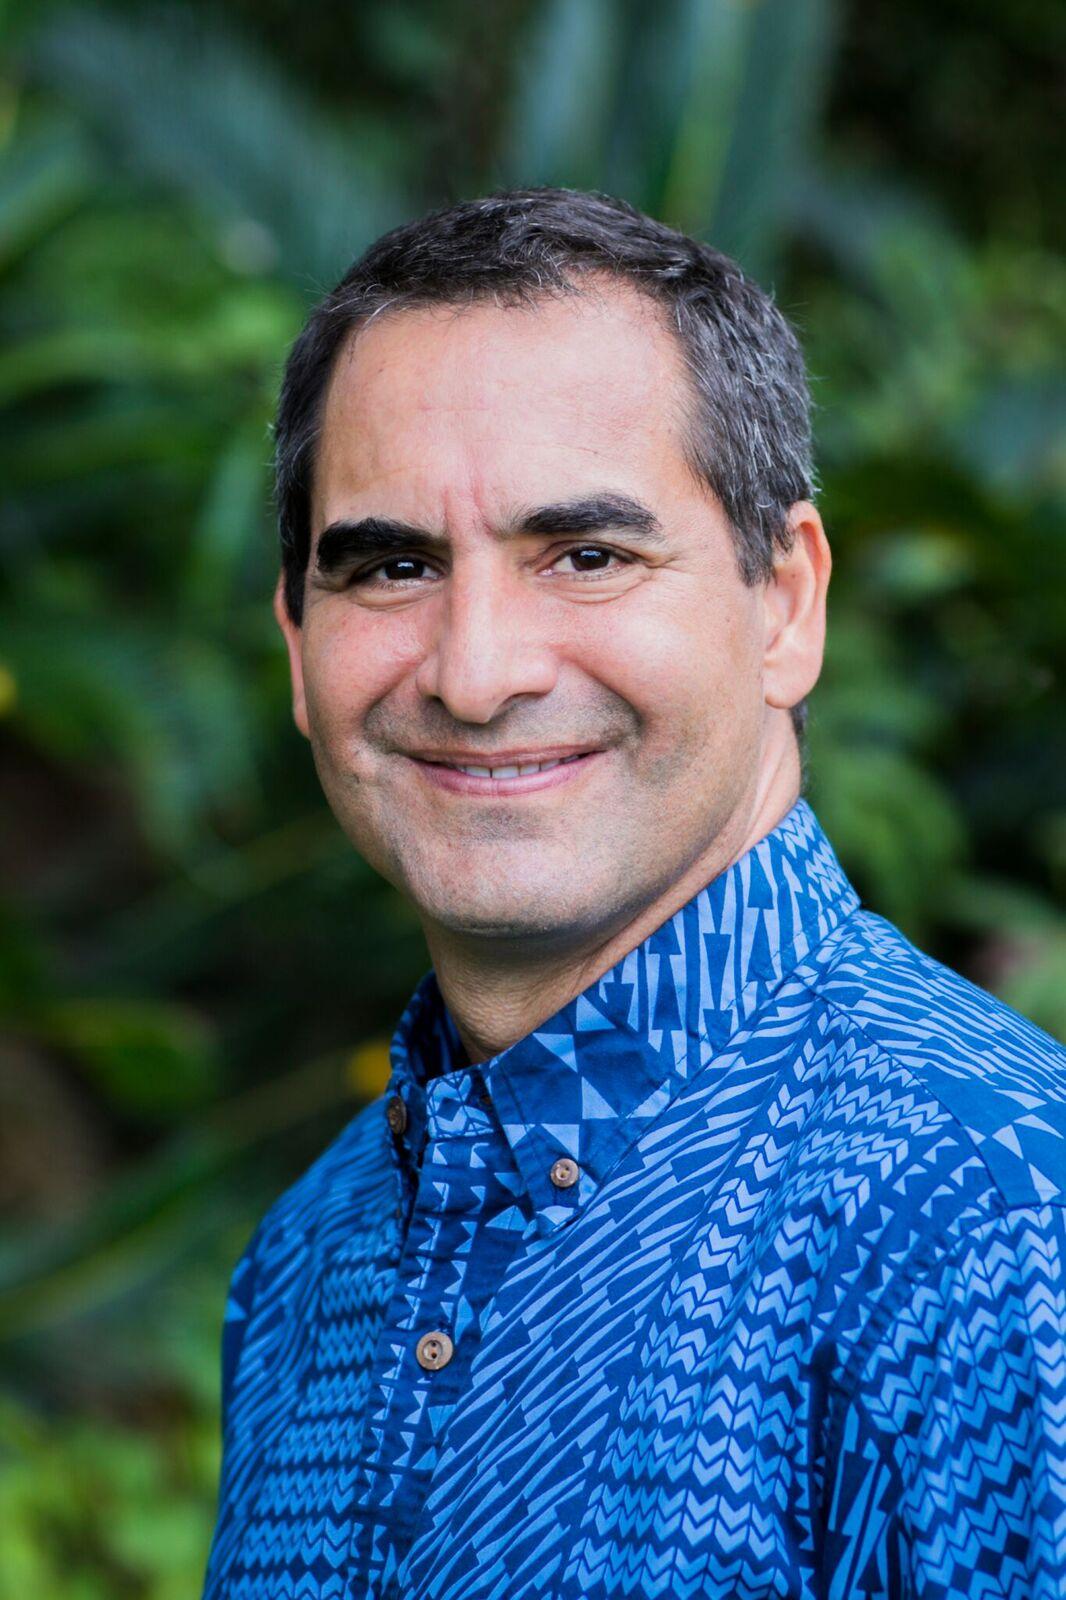 2017 Portrait Mr Rodrigo Romo.png